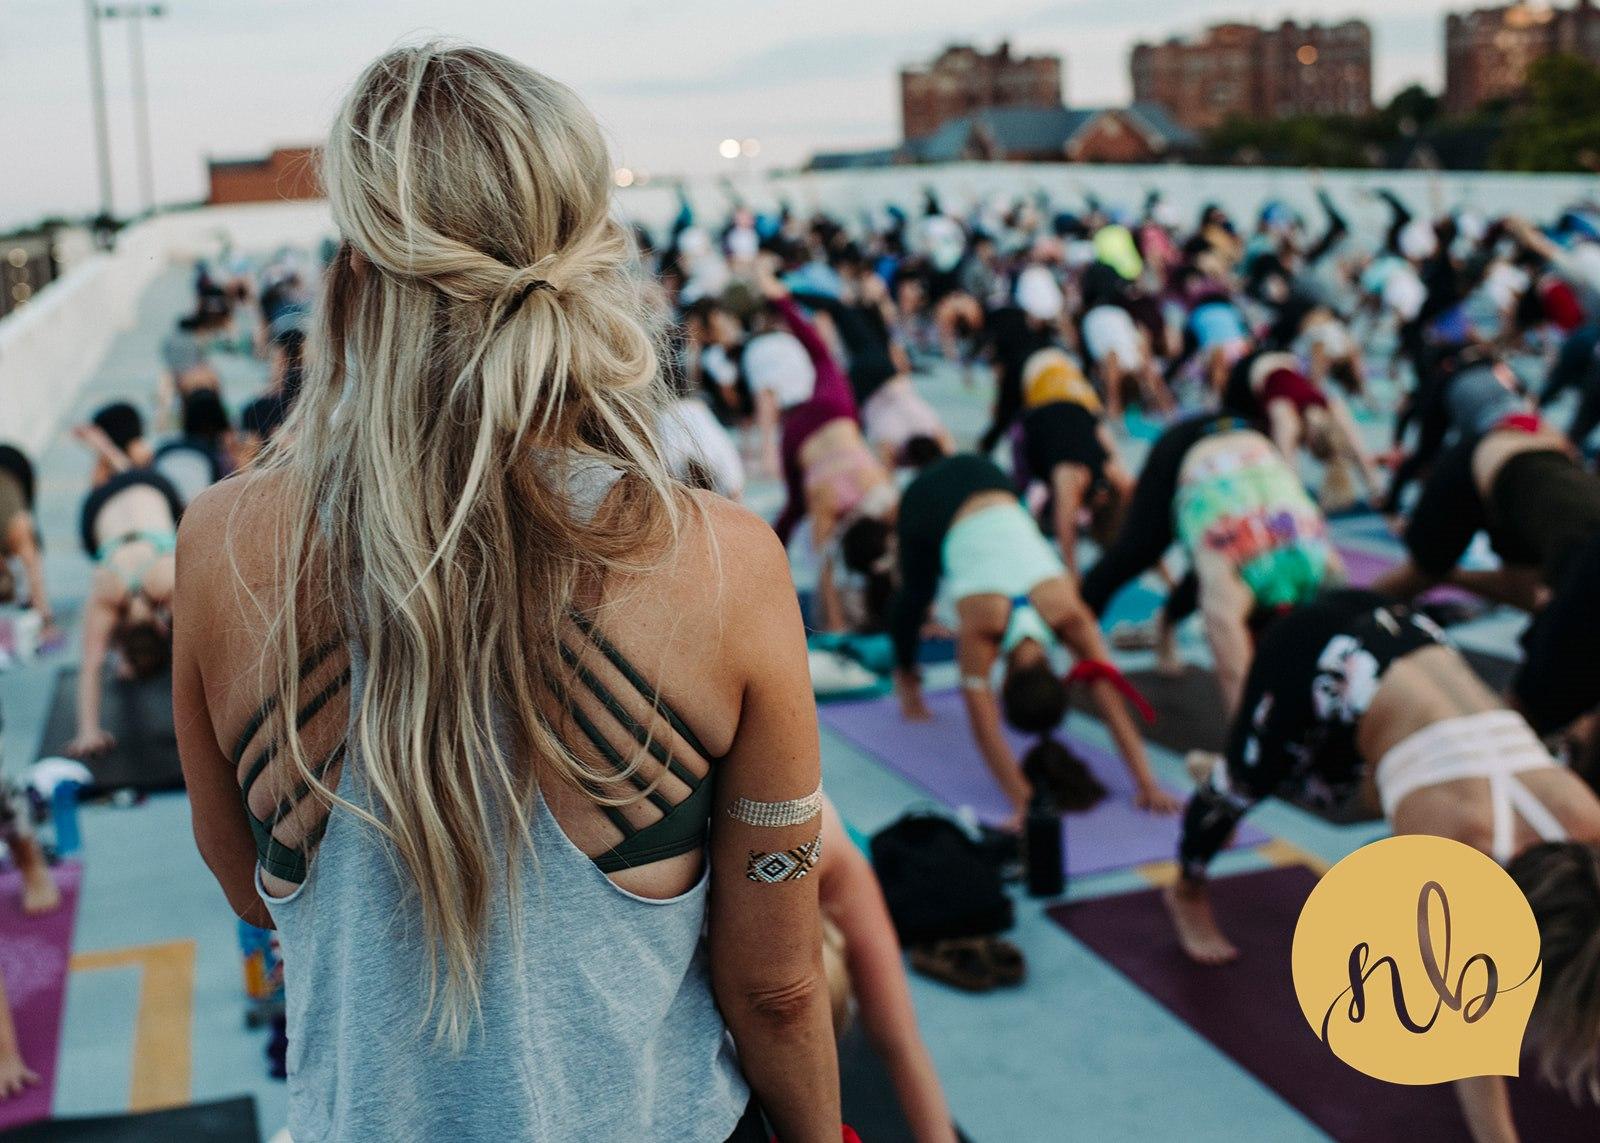 Salute_the_Sunset___Powerlife_Yoga___Nicole_Bissey_Photography_169.jpg